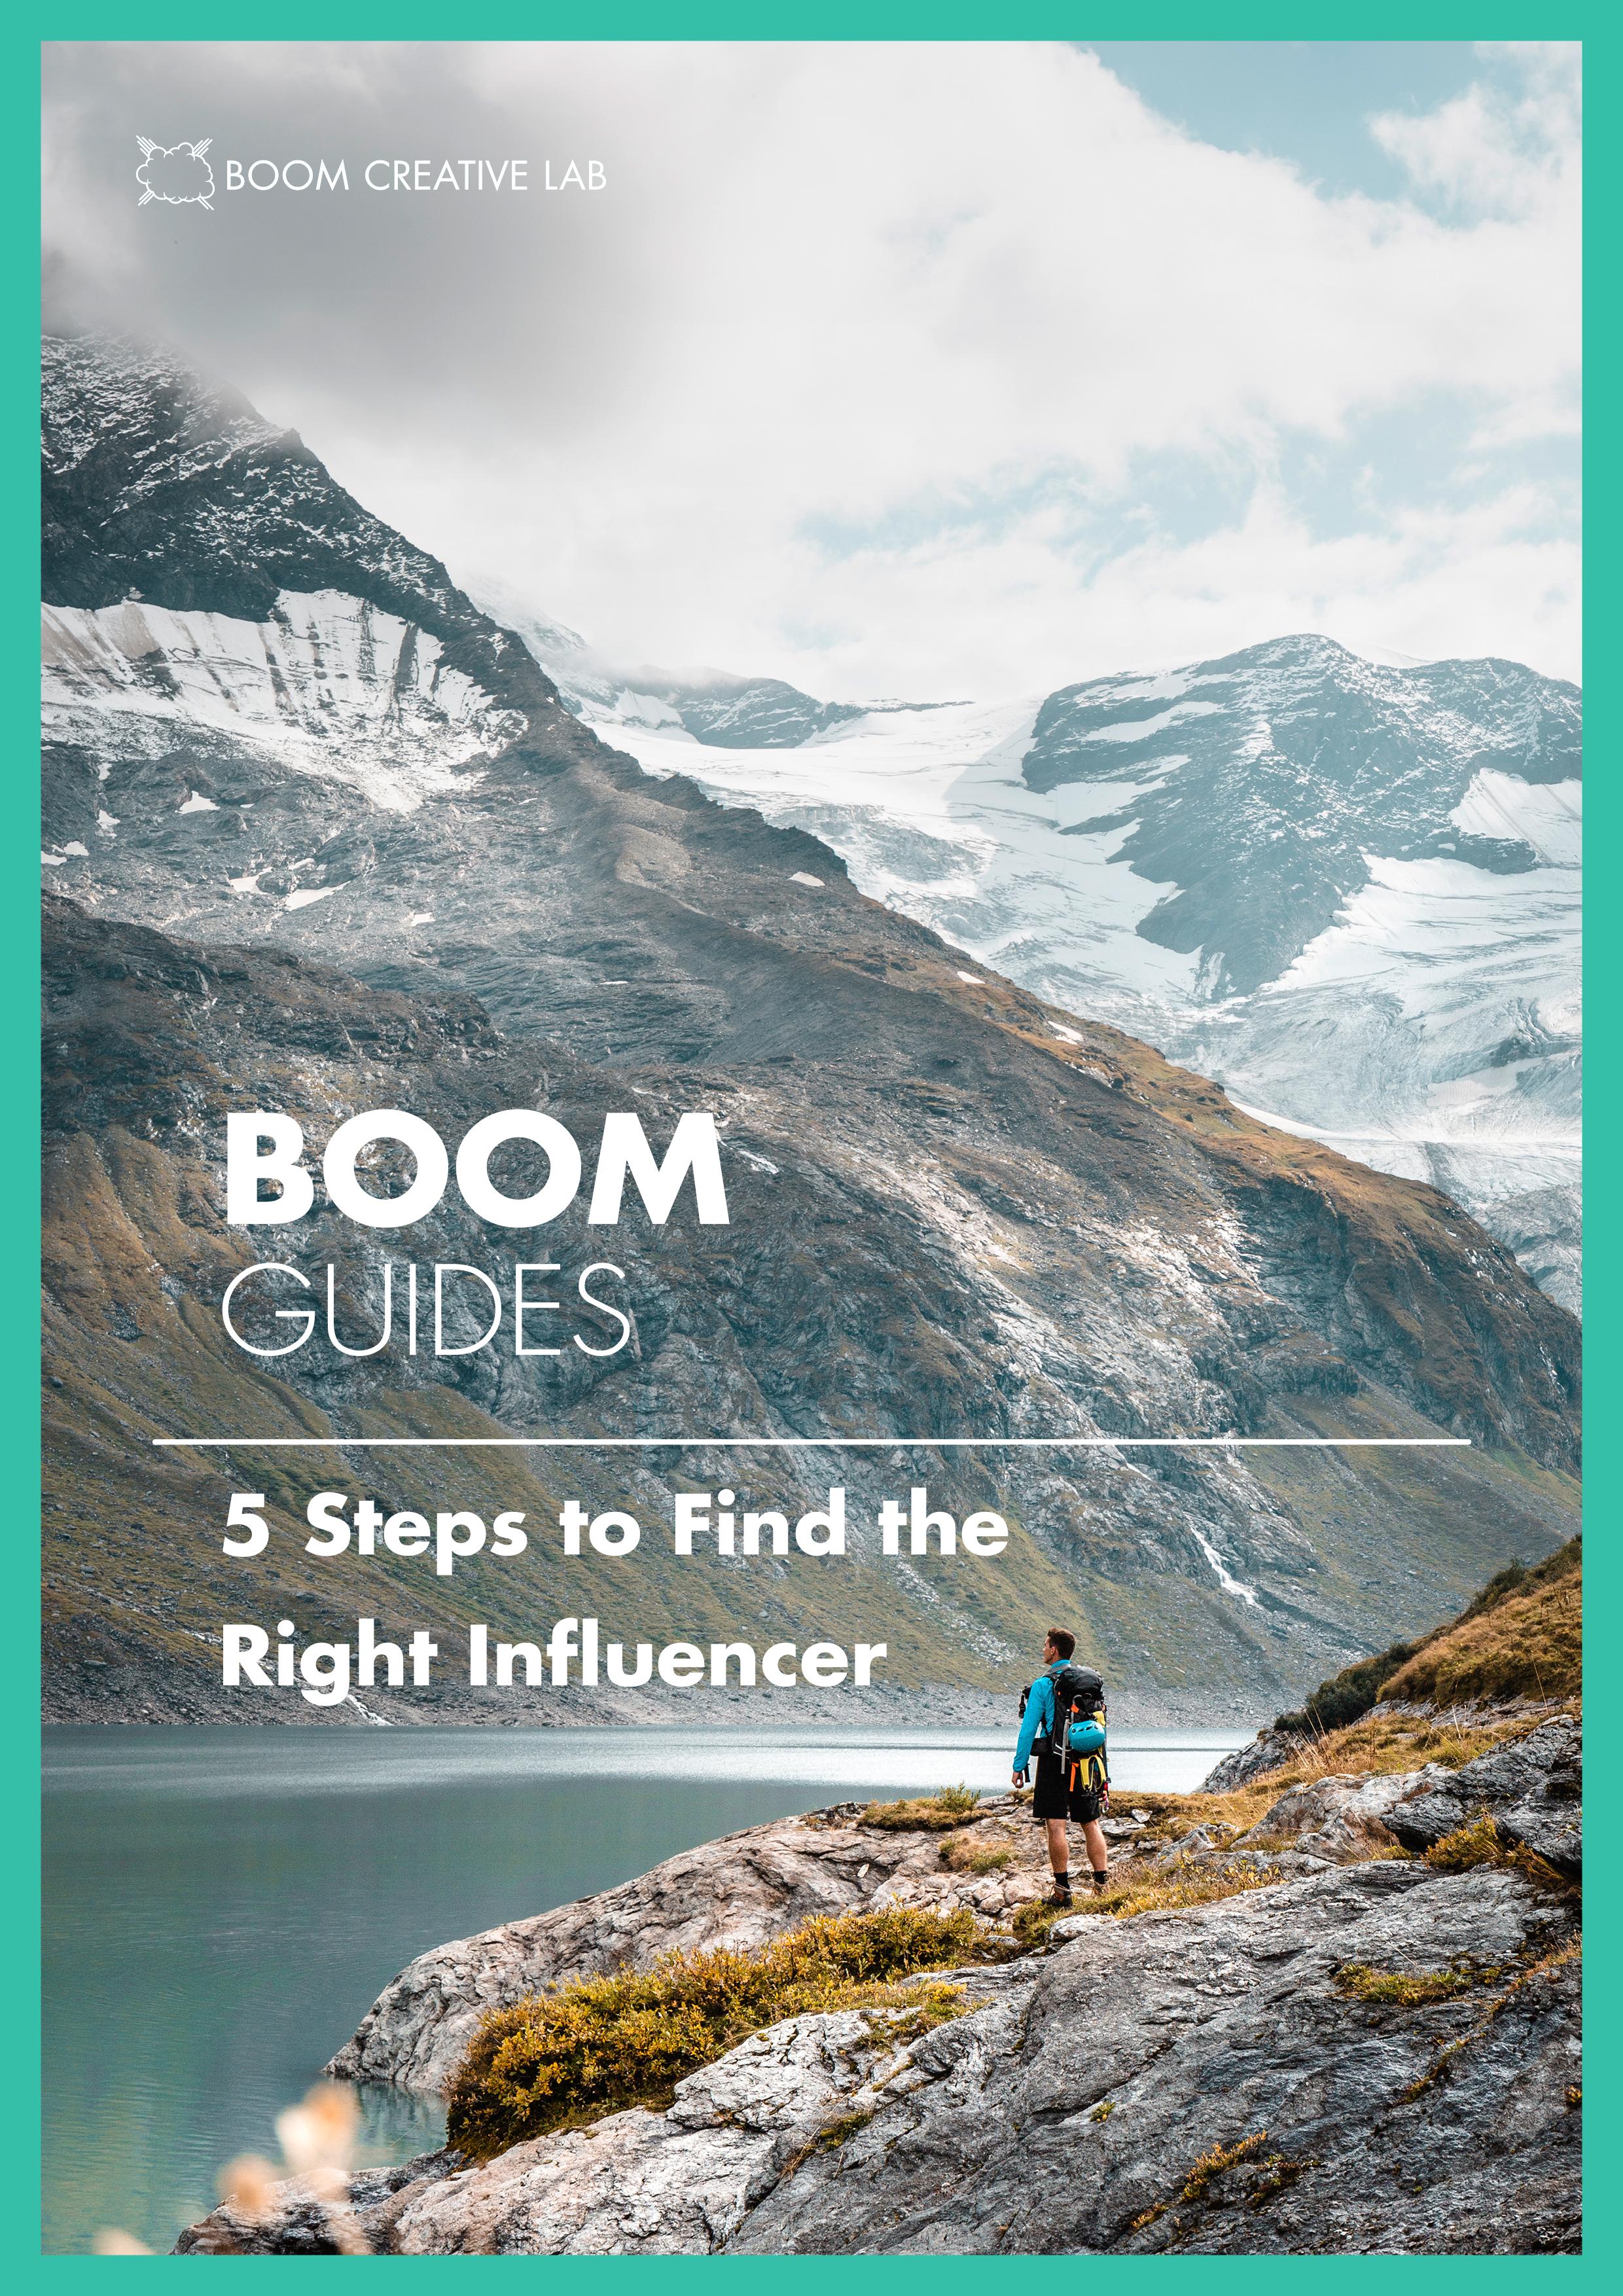 1_Boom Guides Title_1.jpg